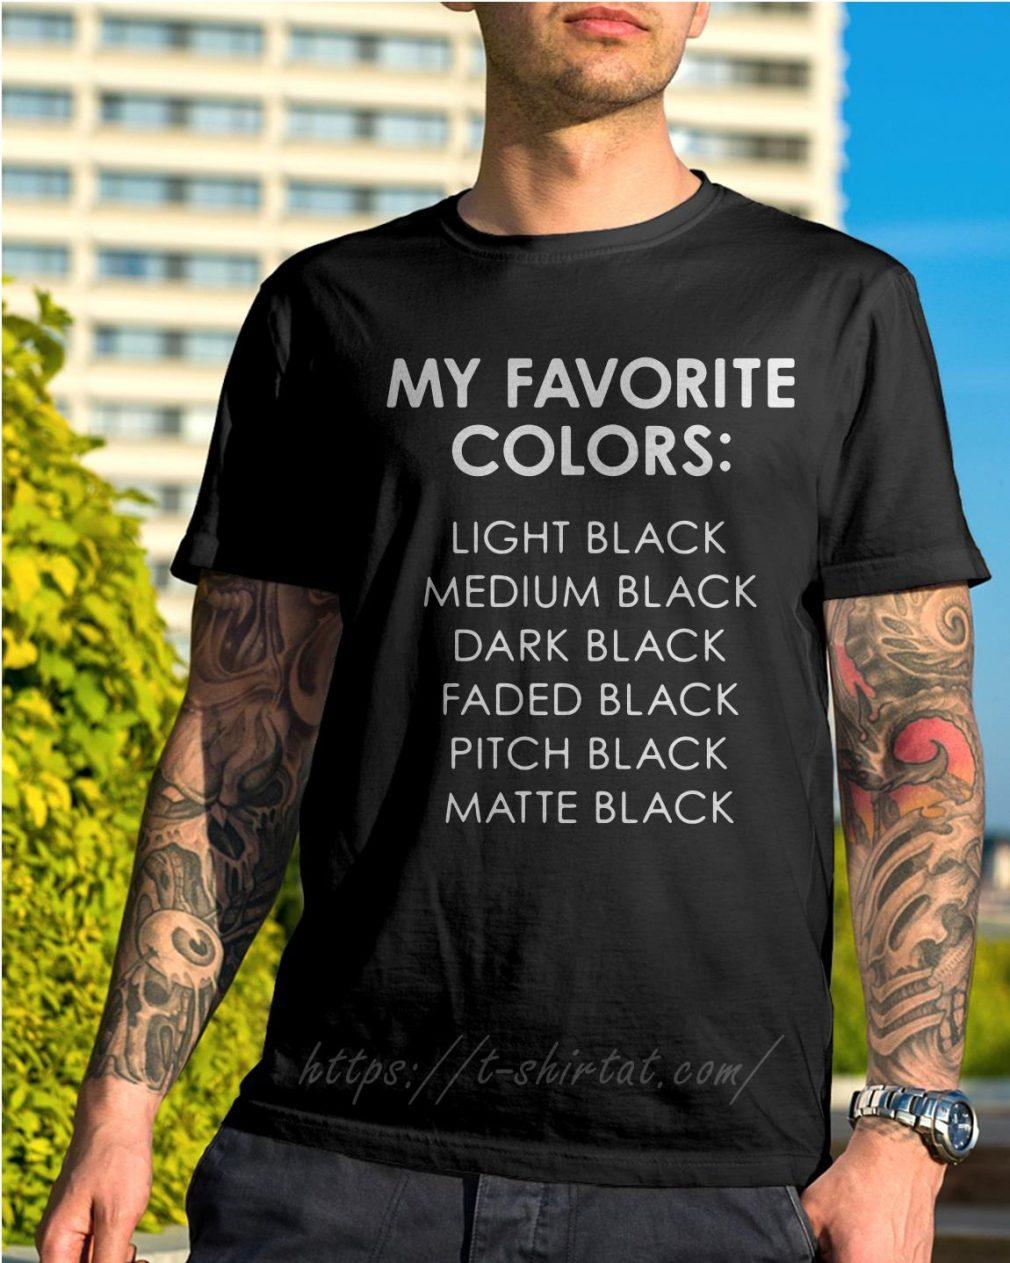 My favorite colors light black medium black dark black faded black pitch black shirtMy favorite colors light black medium black dark black faded black pitch black shirt